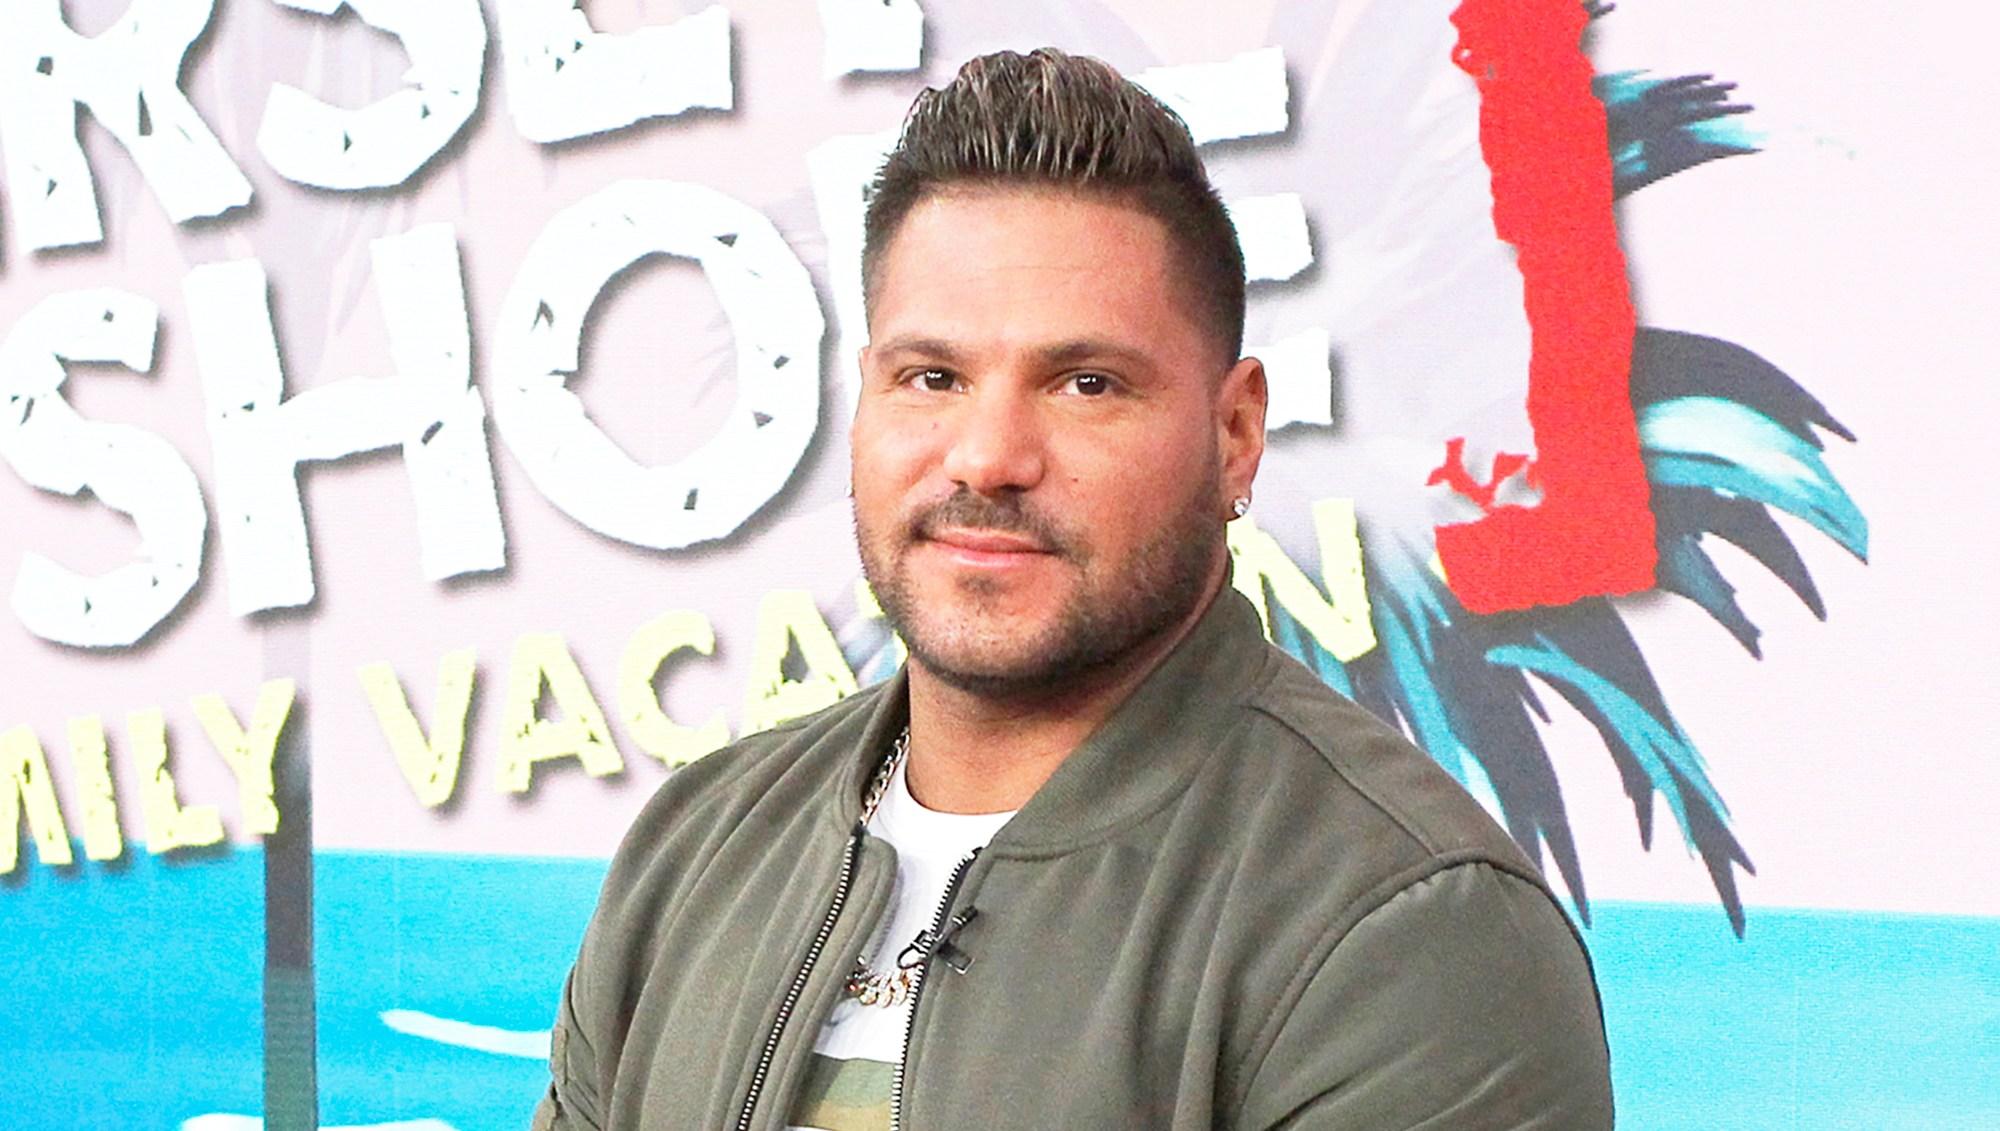 Ronnie Ortiz-Magro on 'Good Morning America'